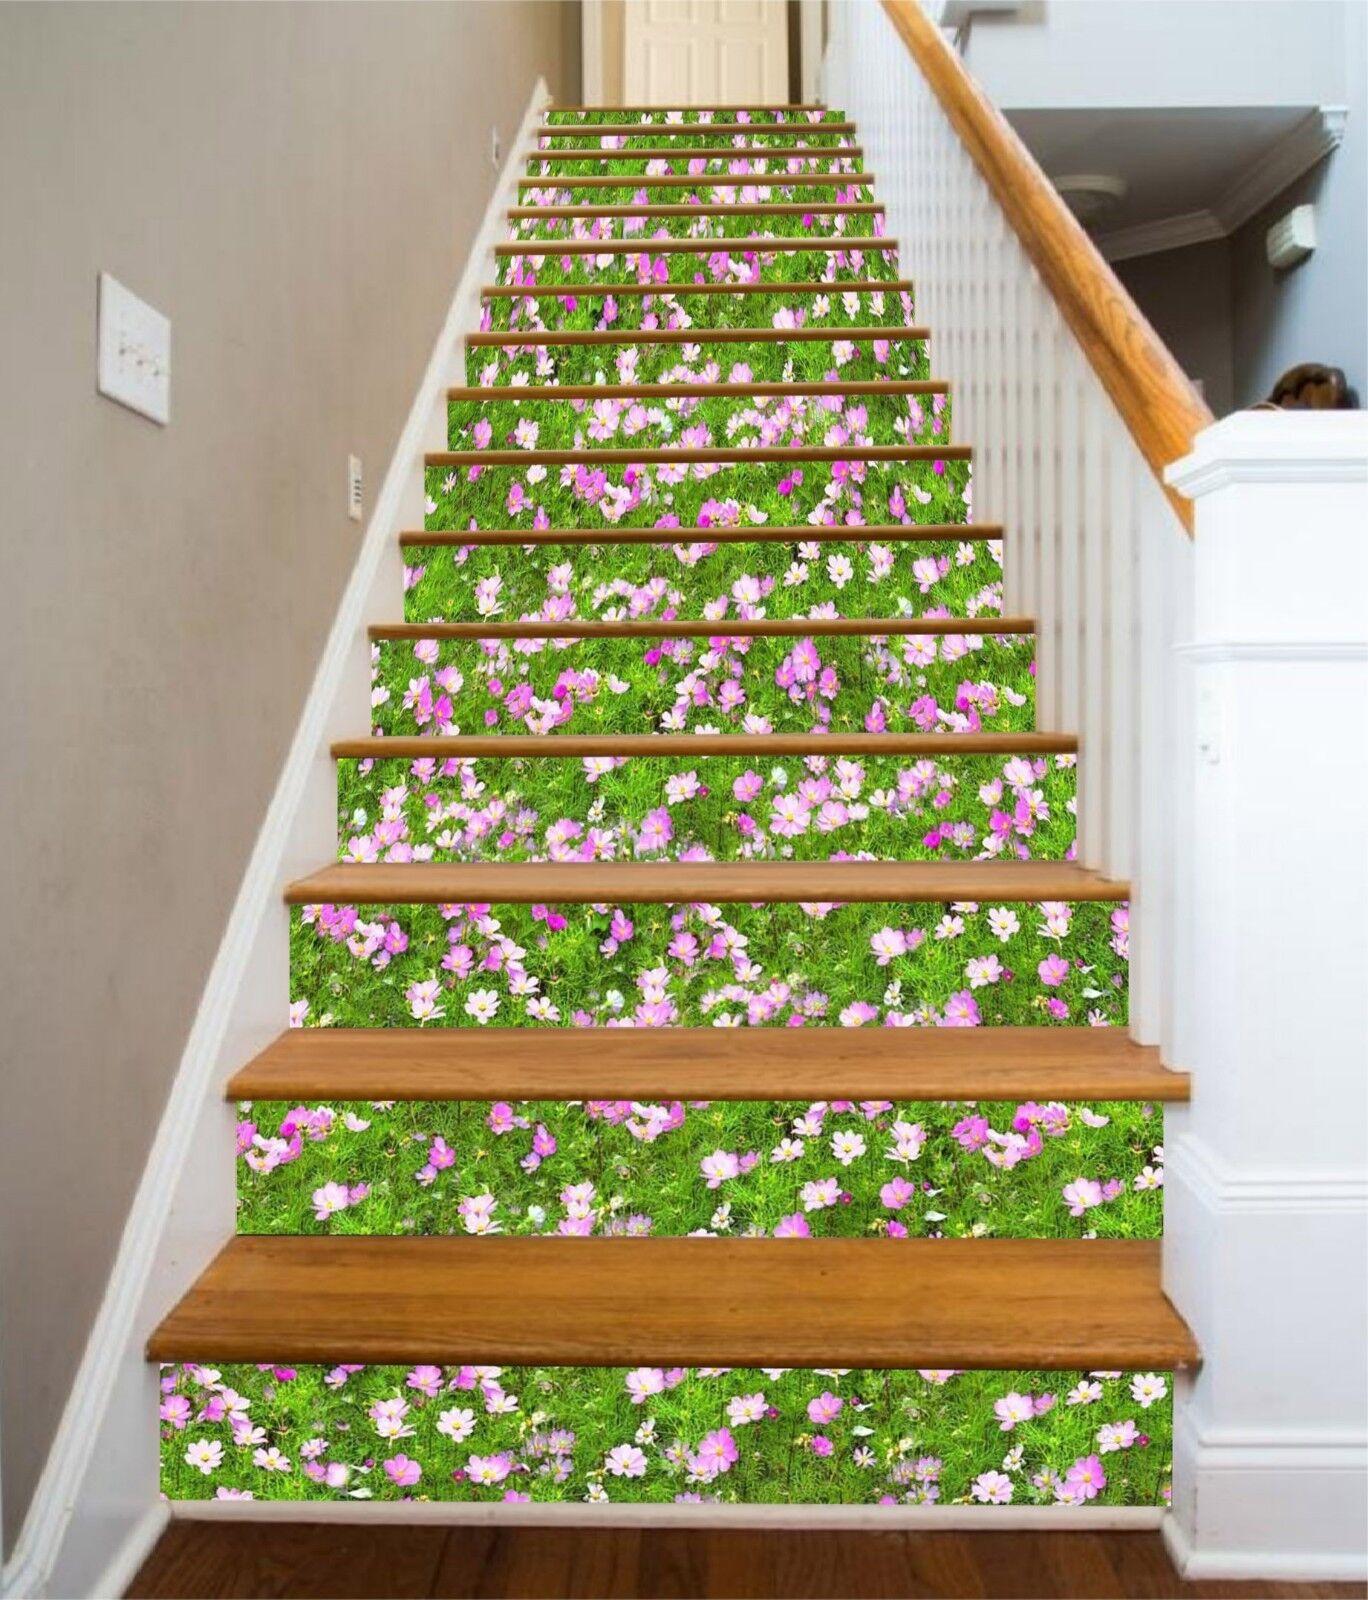 3D Field Flowers Stair Risers Decoration Photo Mural Vinyl Decal Wallpaper CA